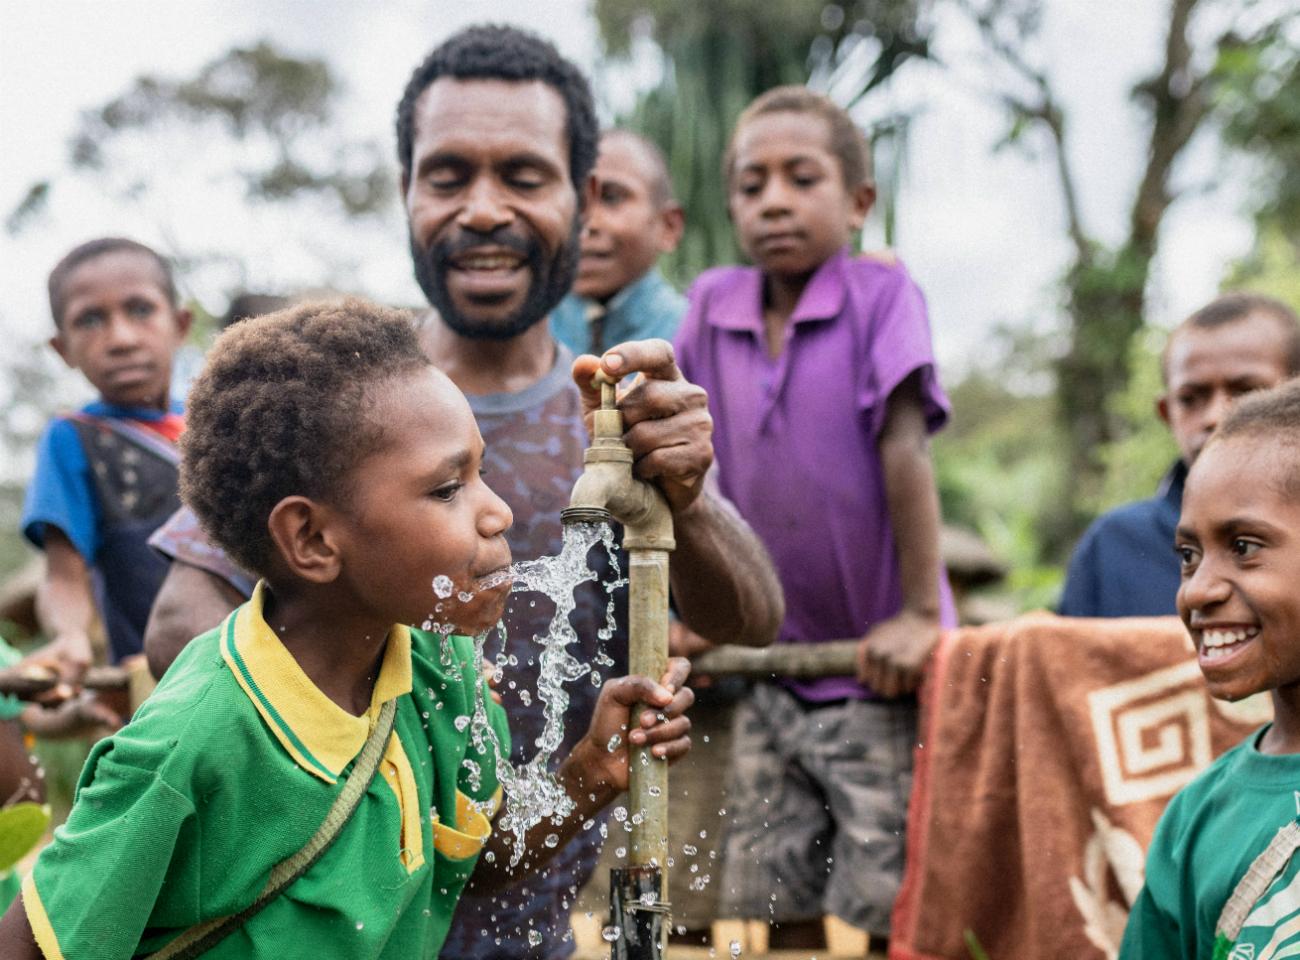 Children drinking water from tap